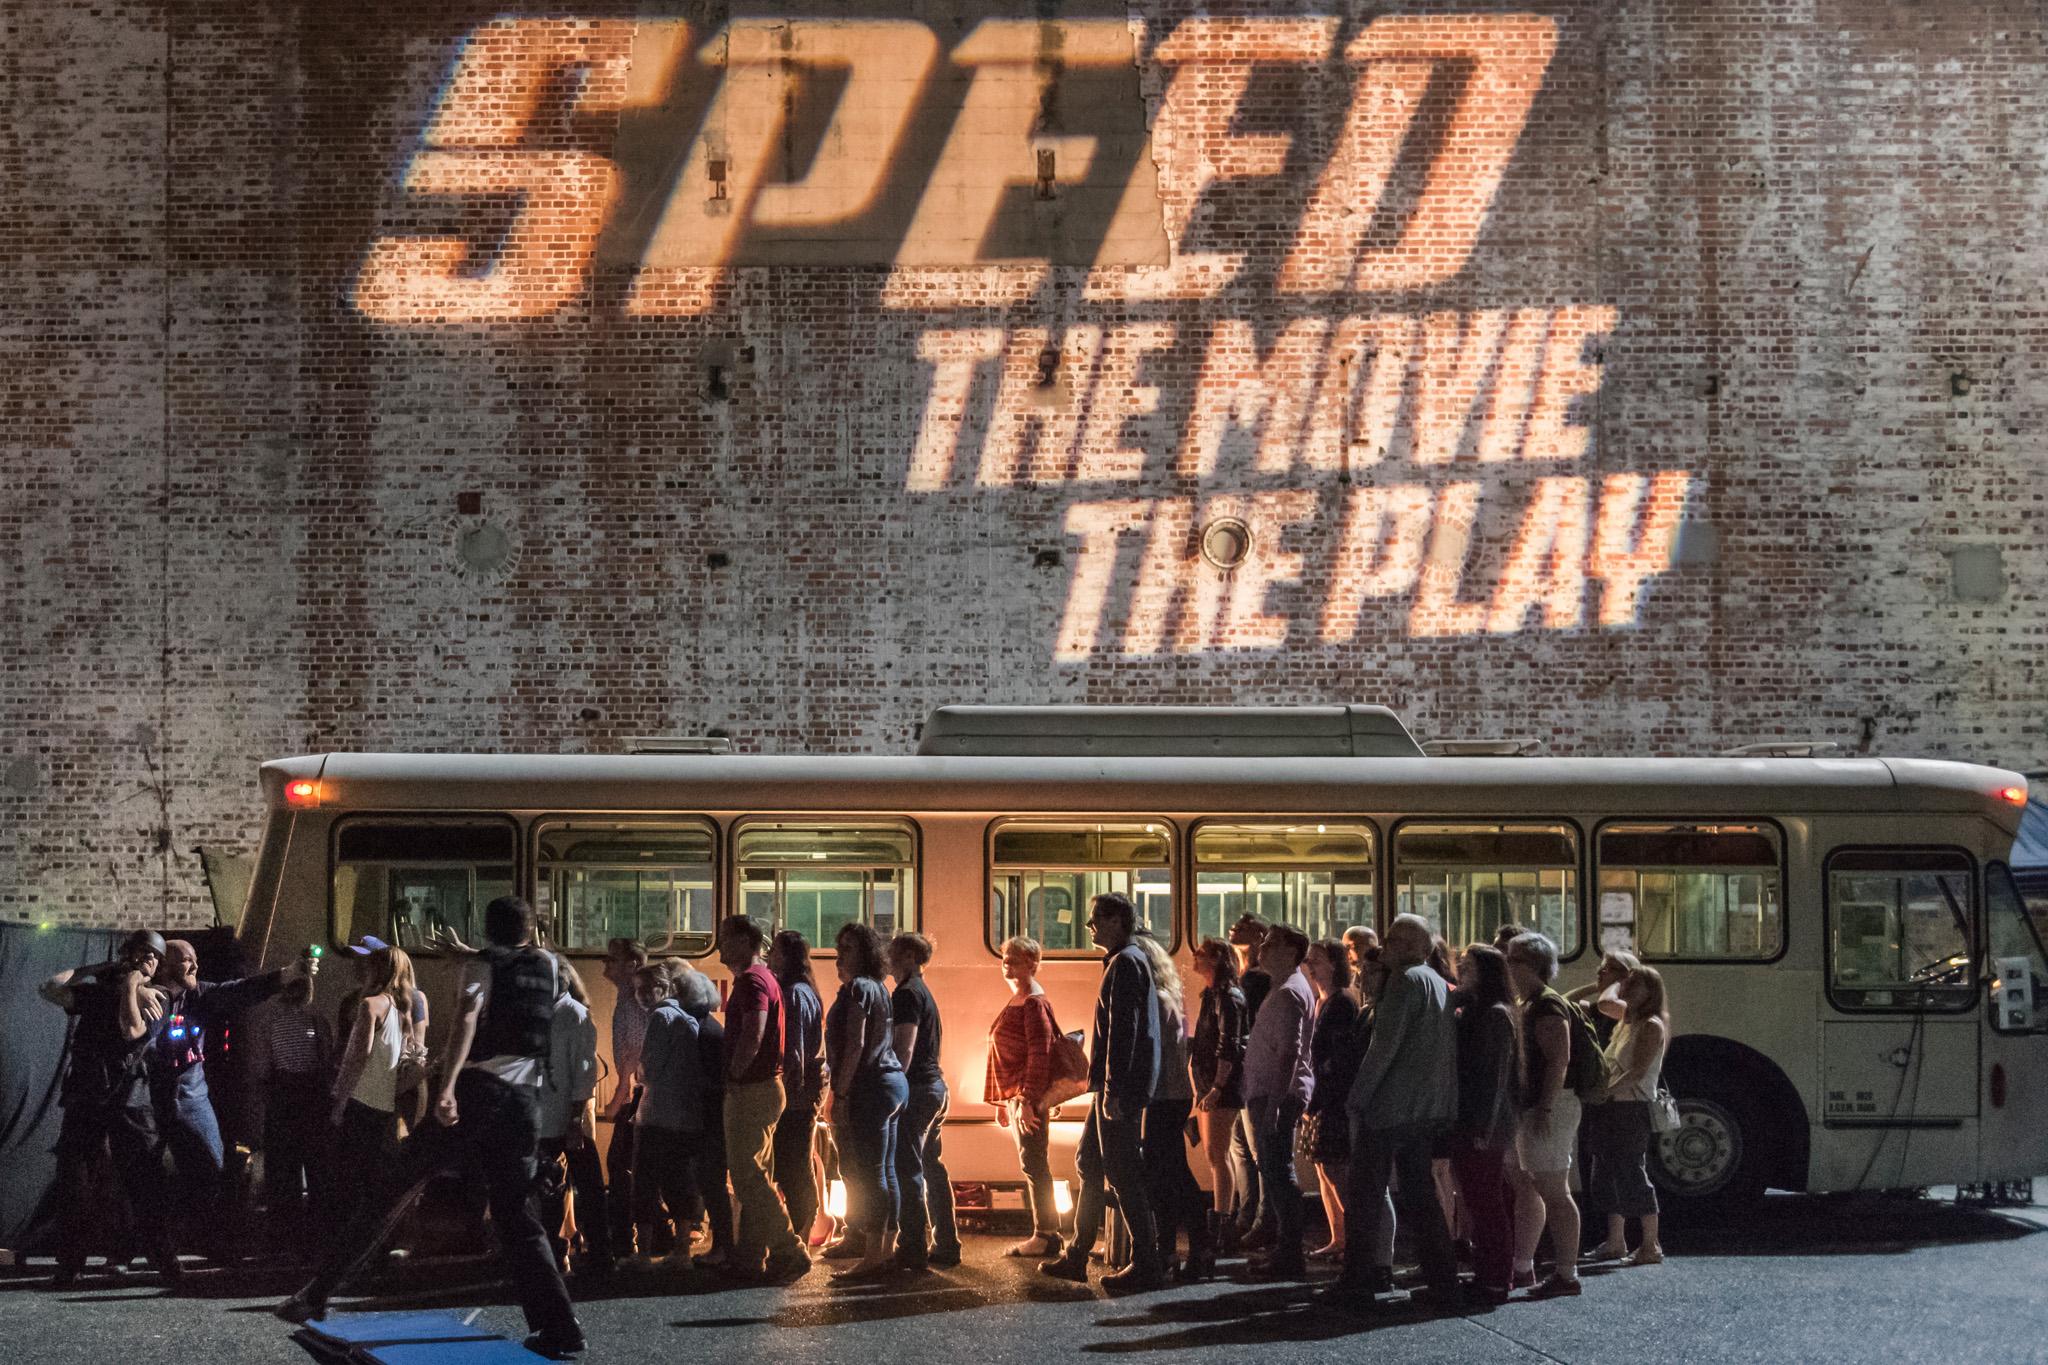 Speed-the-movie-the-play-05.jpg